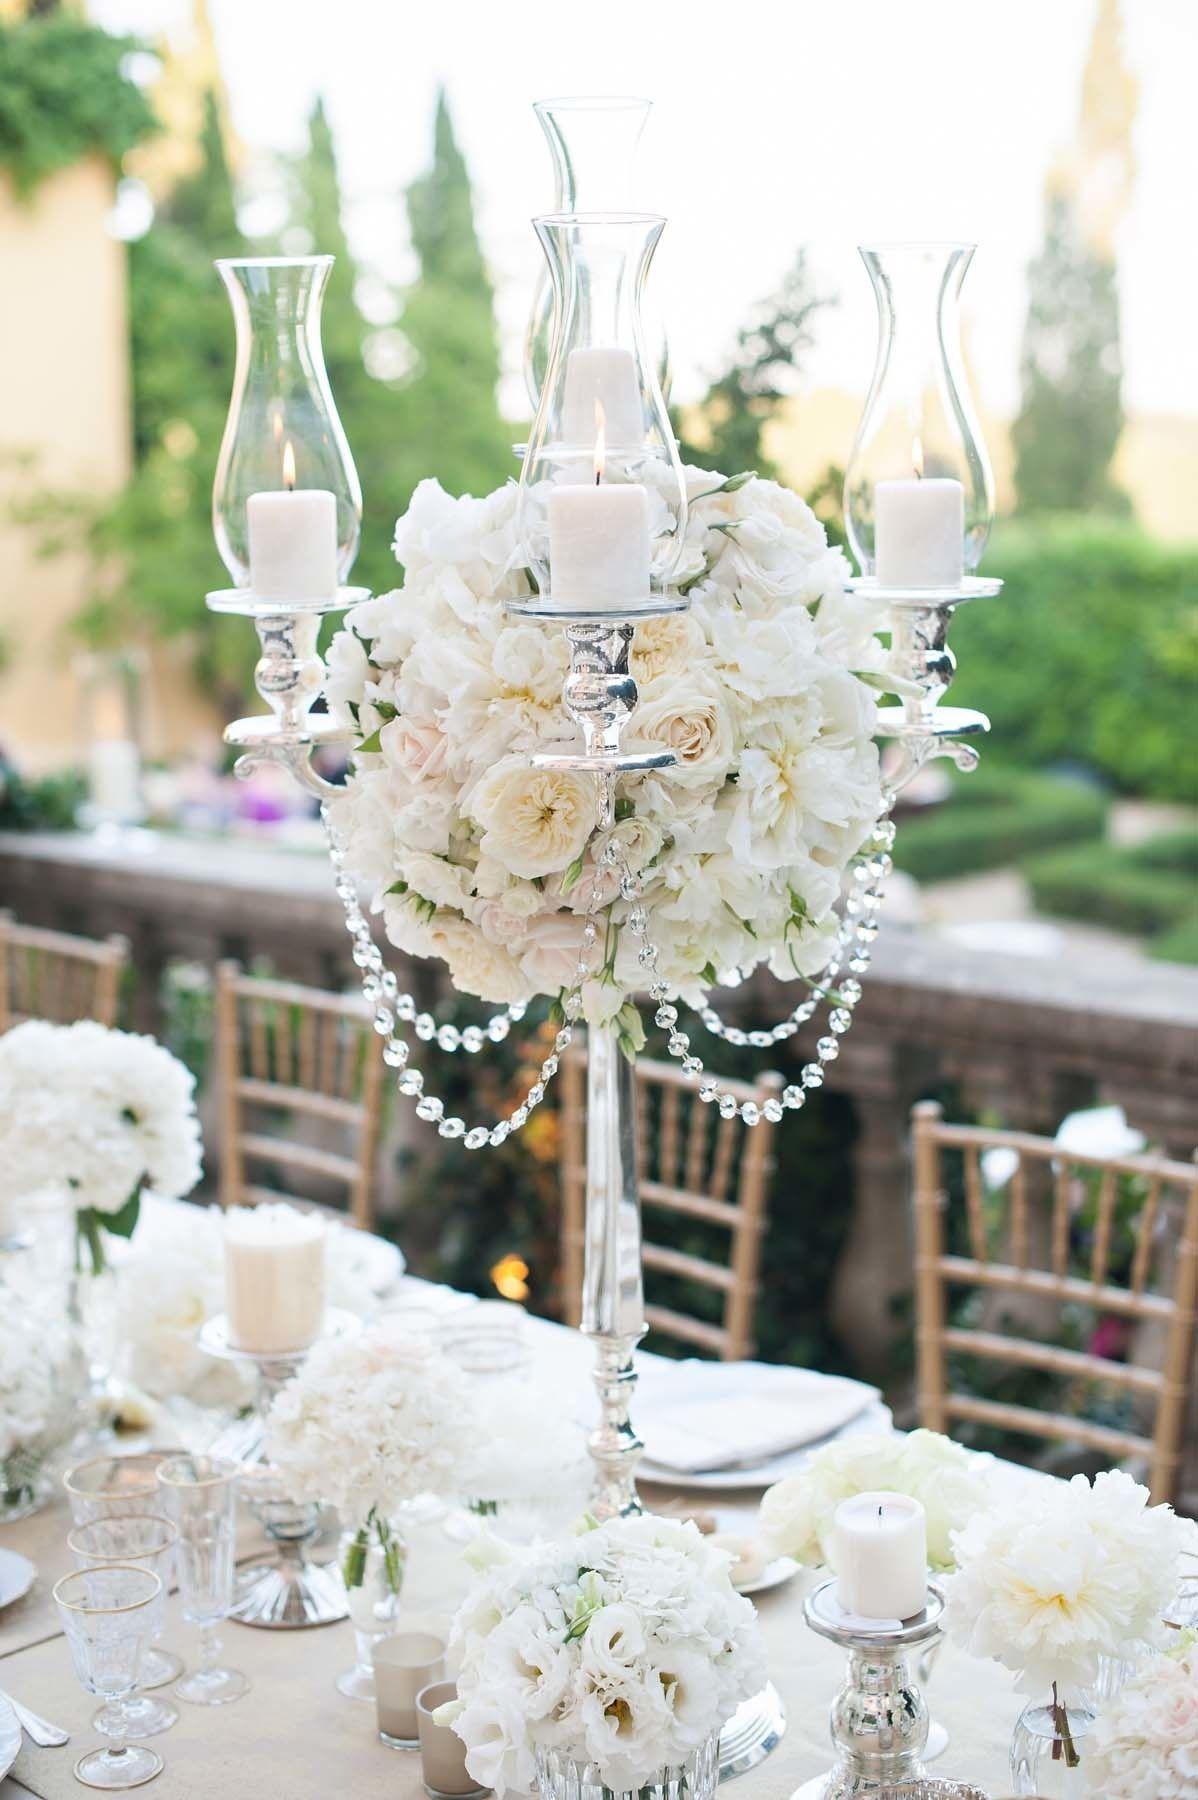 American-Scottish Destination Wedding in Tuscany | Italy wedding ...